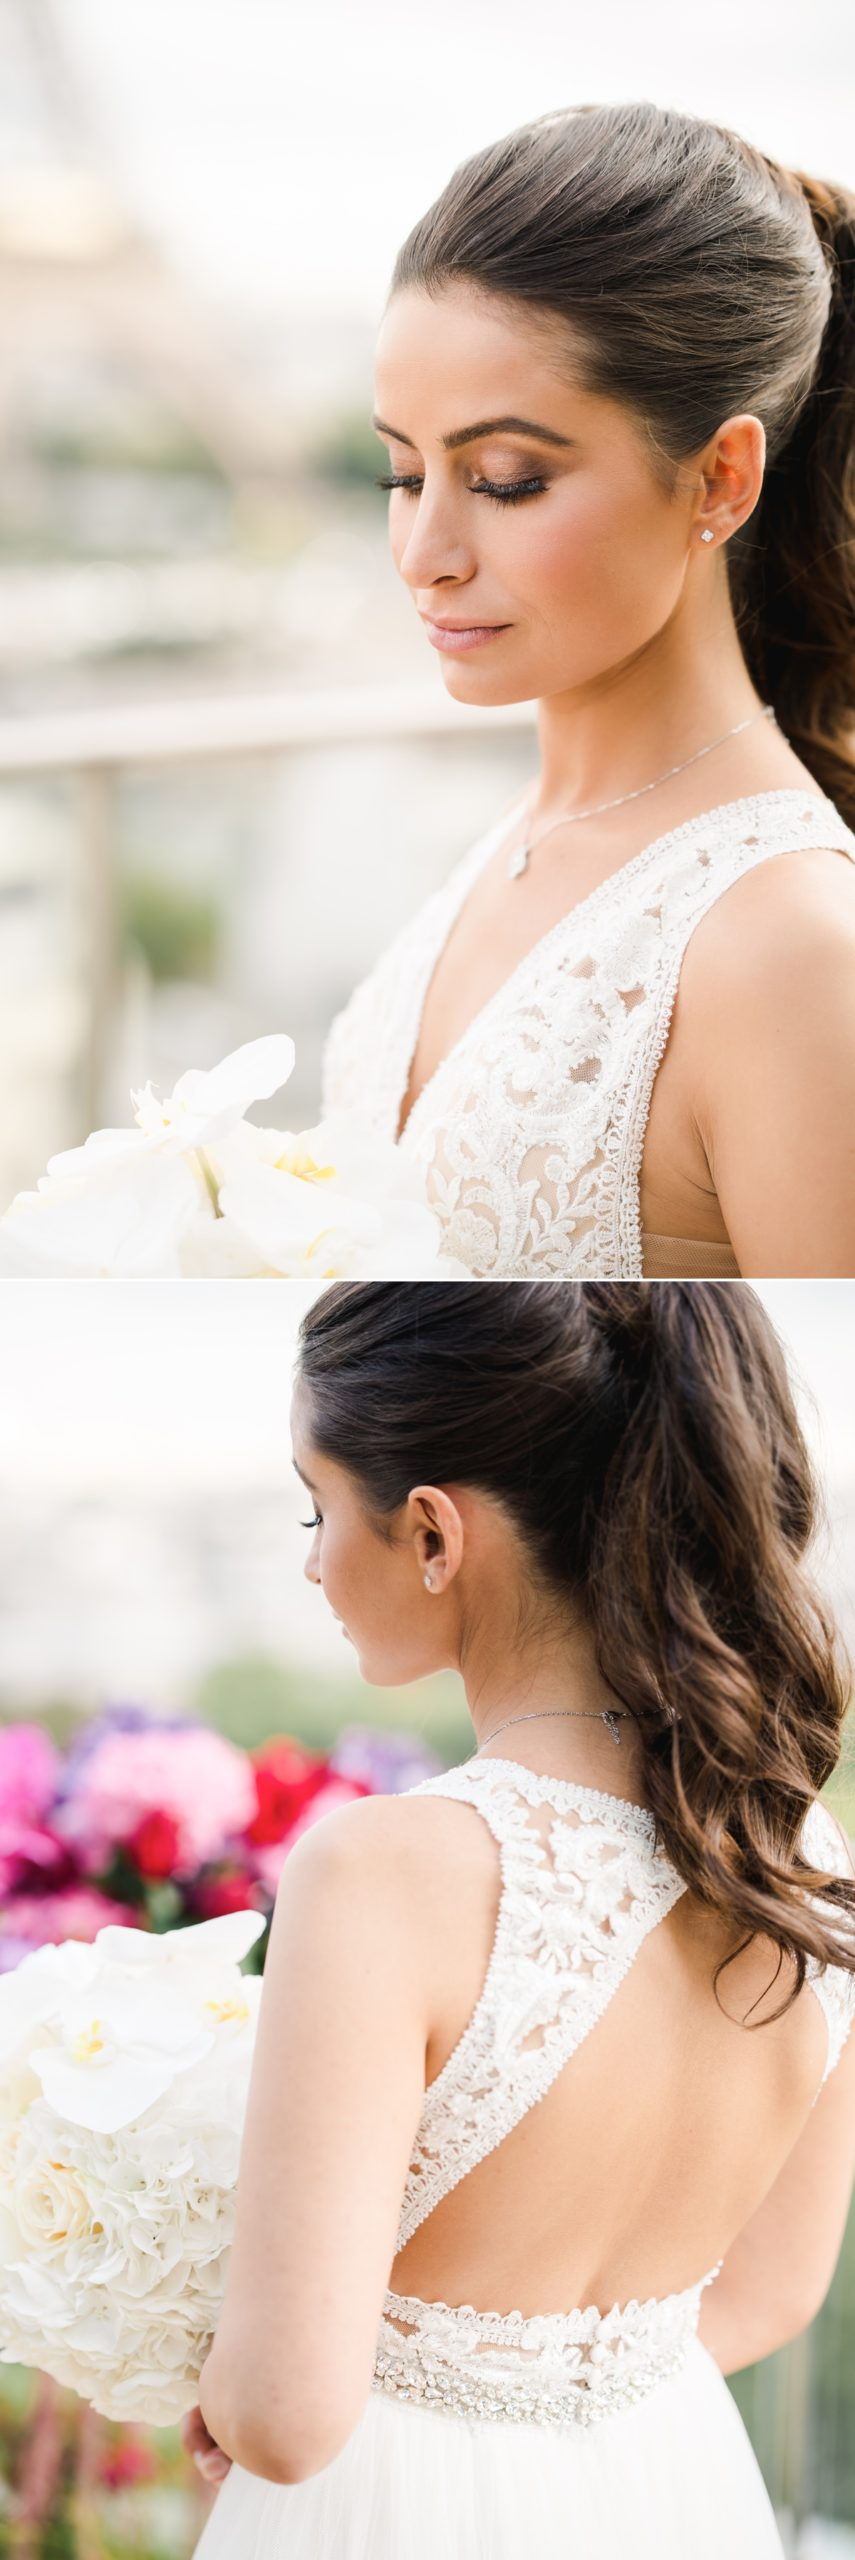 shangri-la paris wedding photographer www.benandhopeweddings.com.au